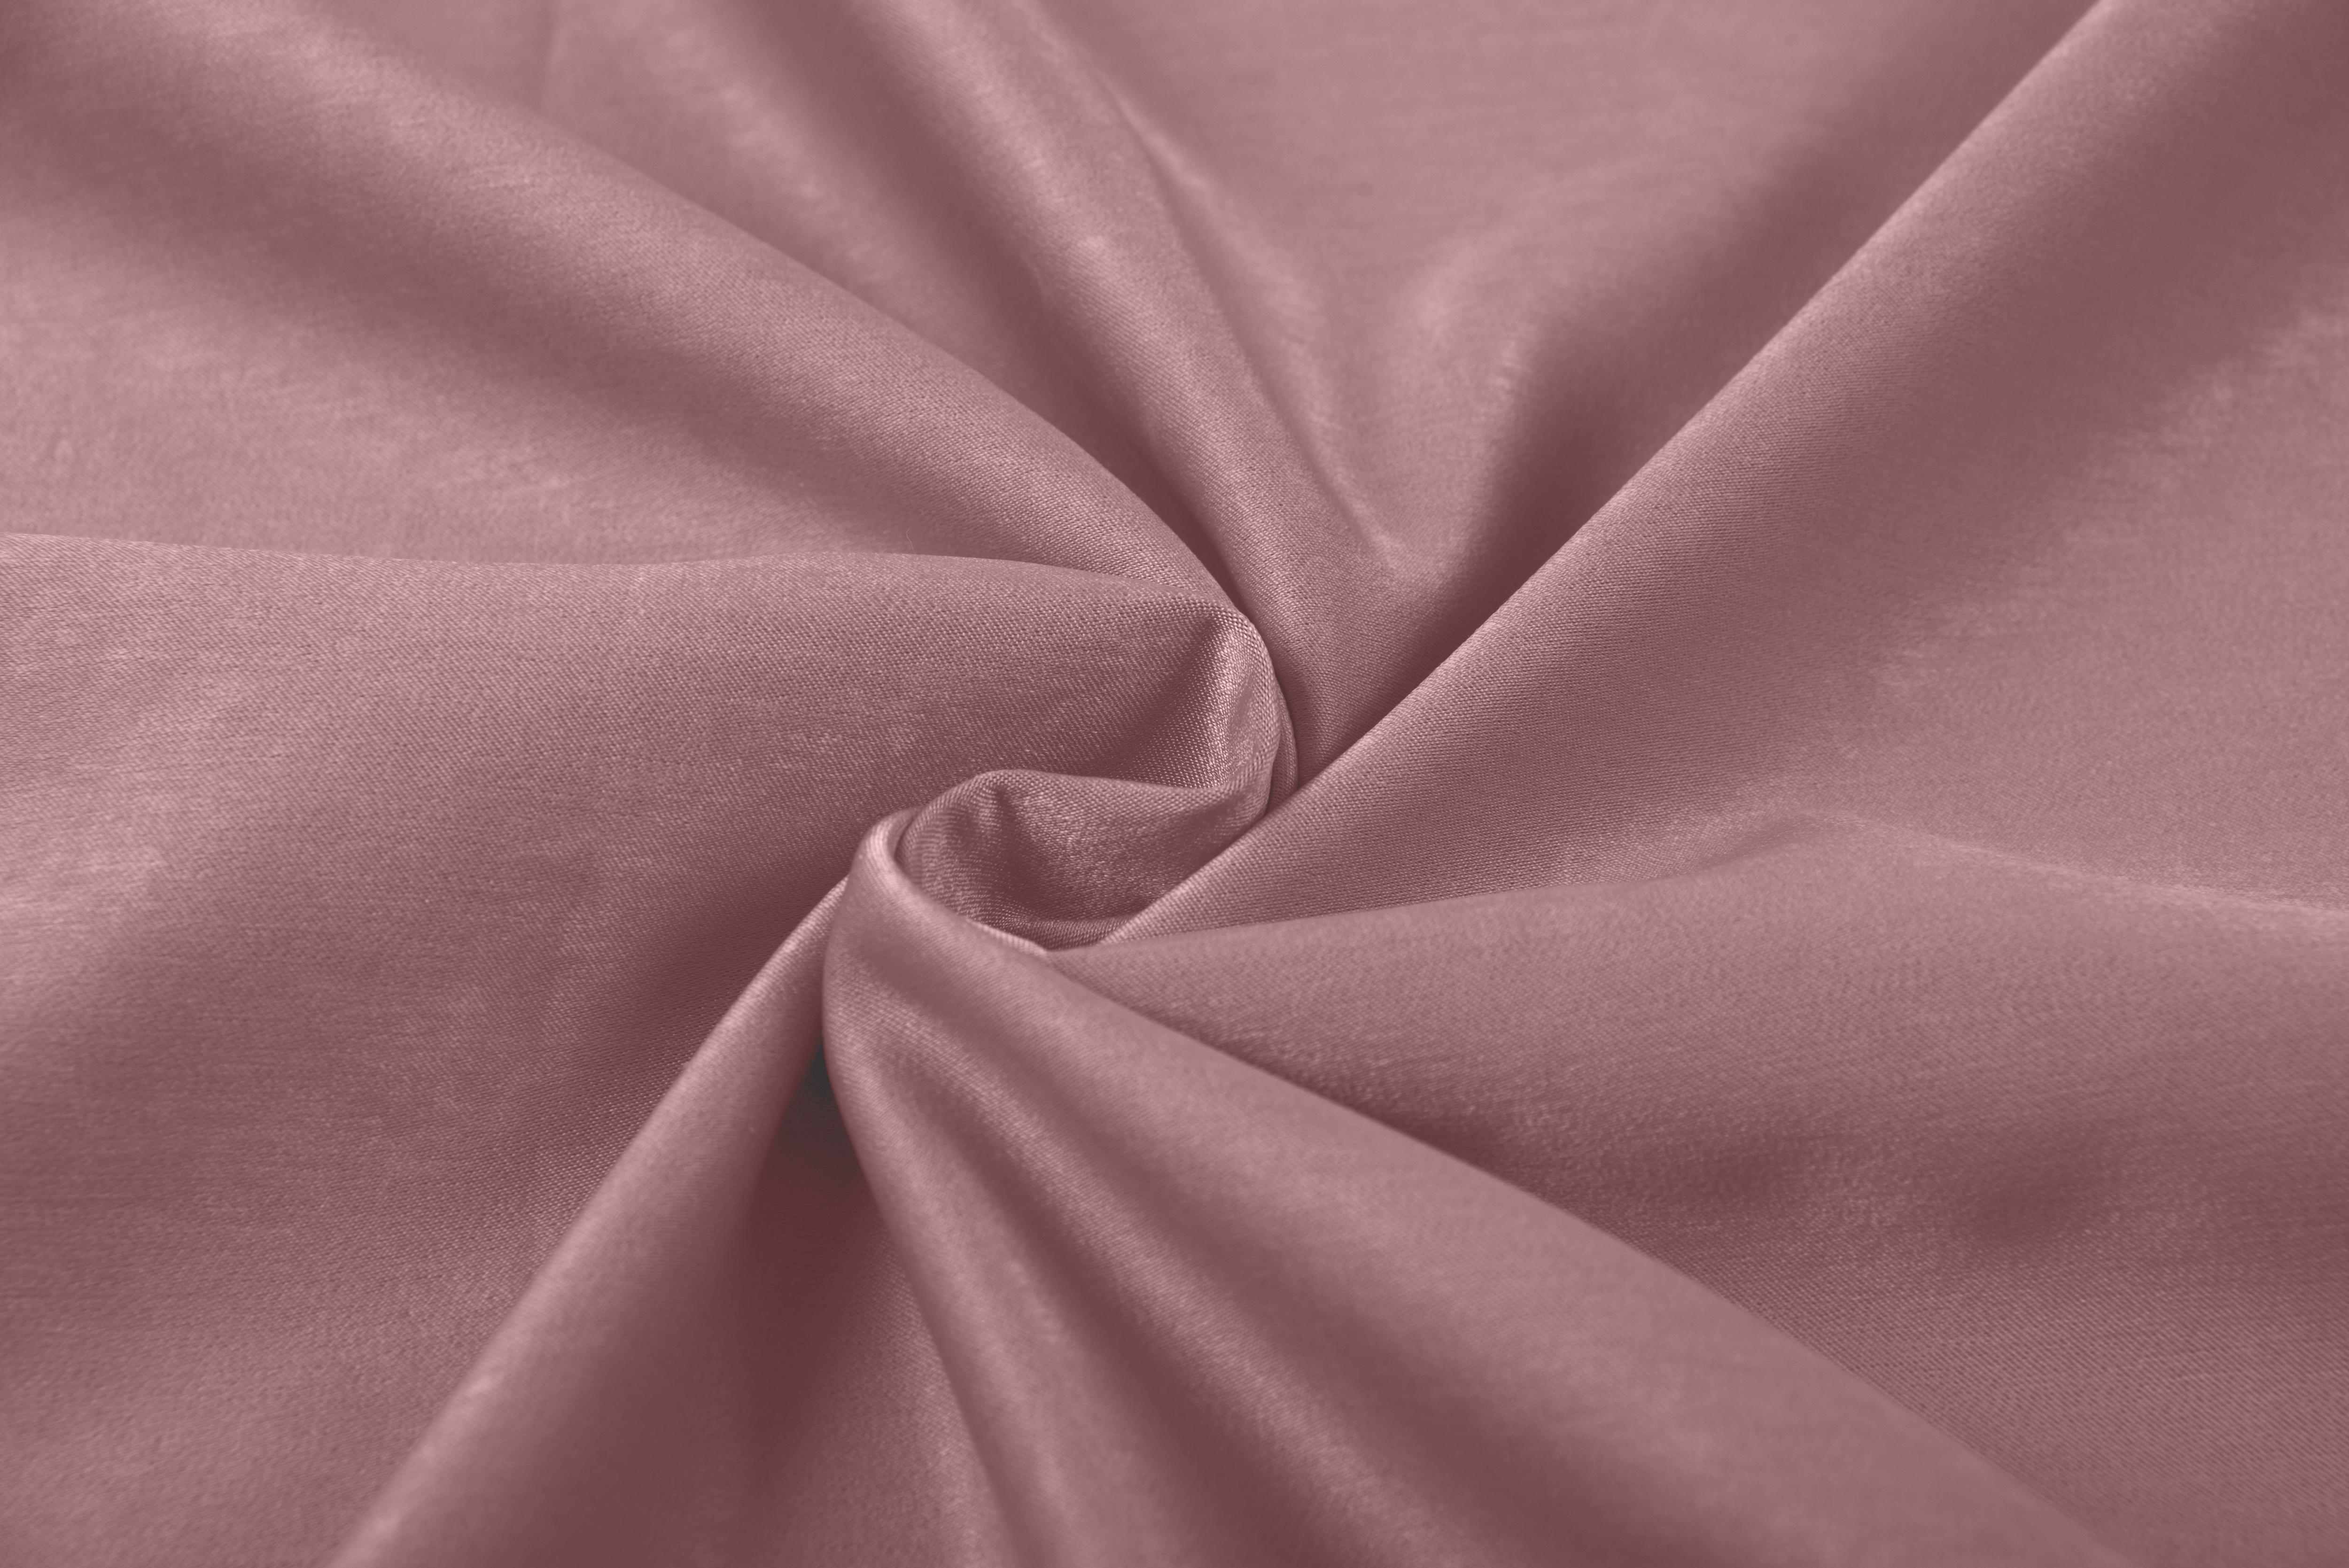 {} TexRepublic Материал Бархат Wet Silk Цвет: Брусника texrepublic материал бархат wet silk цвет брусника